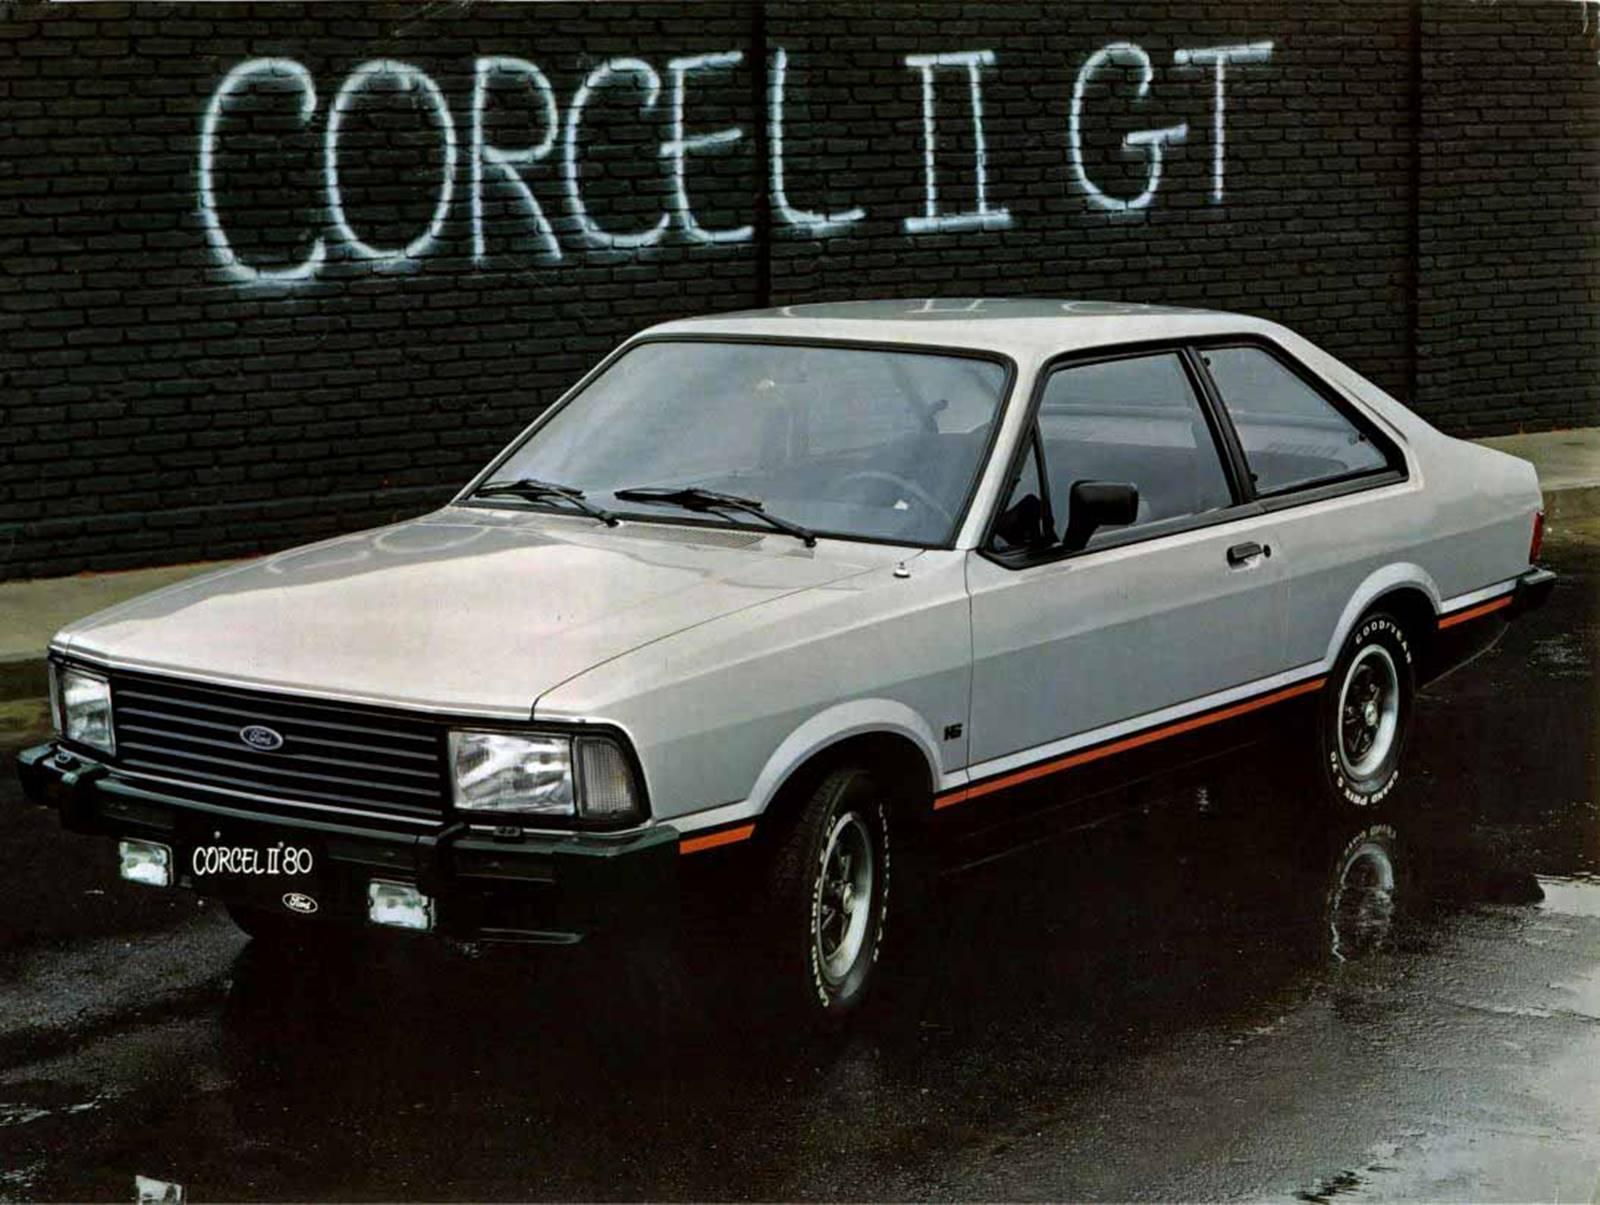 2073af0cc17 Ford comemora aniversario de 50 anos do Corcel - Brasil